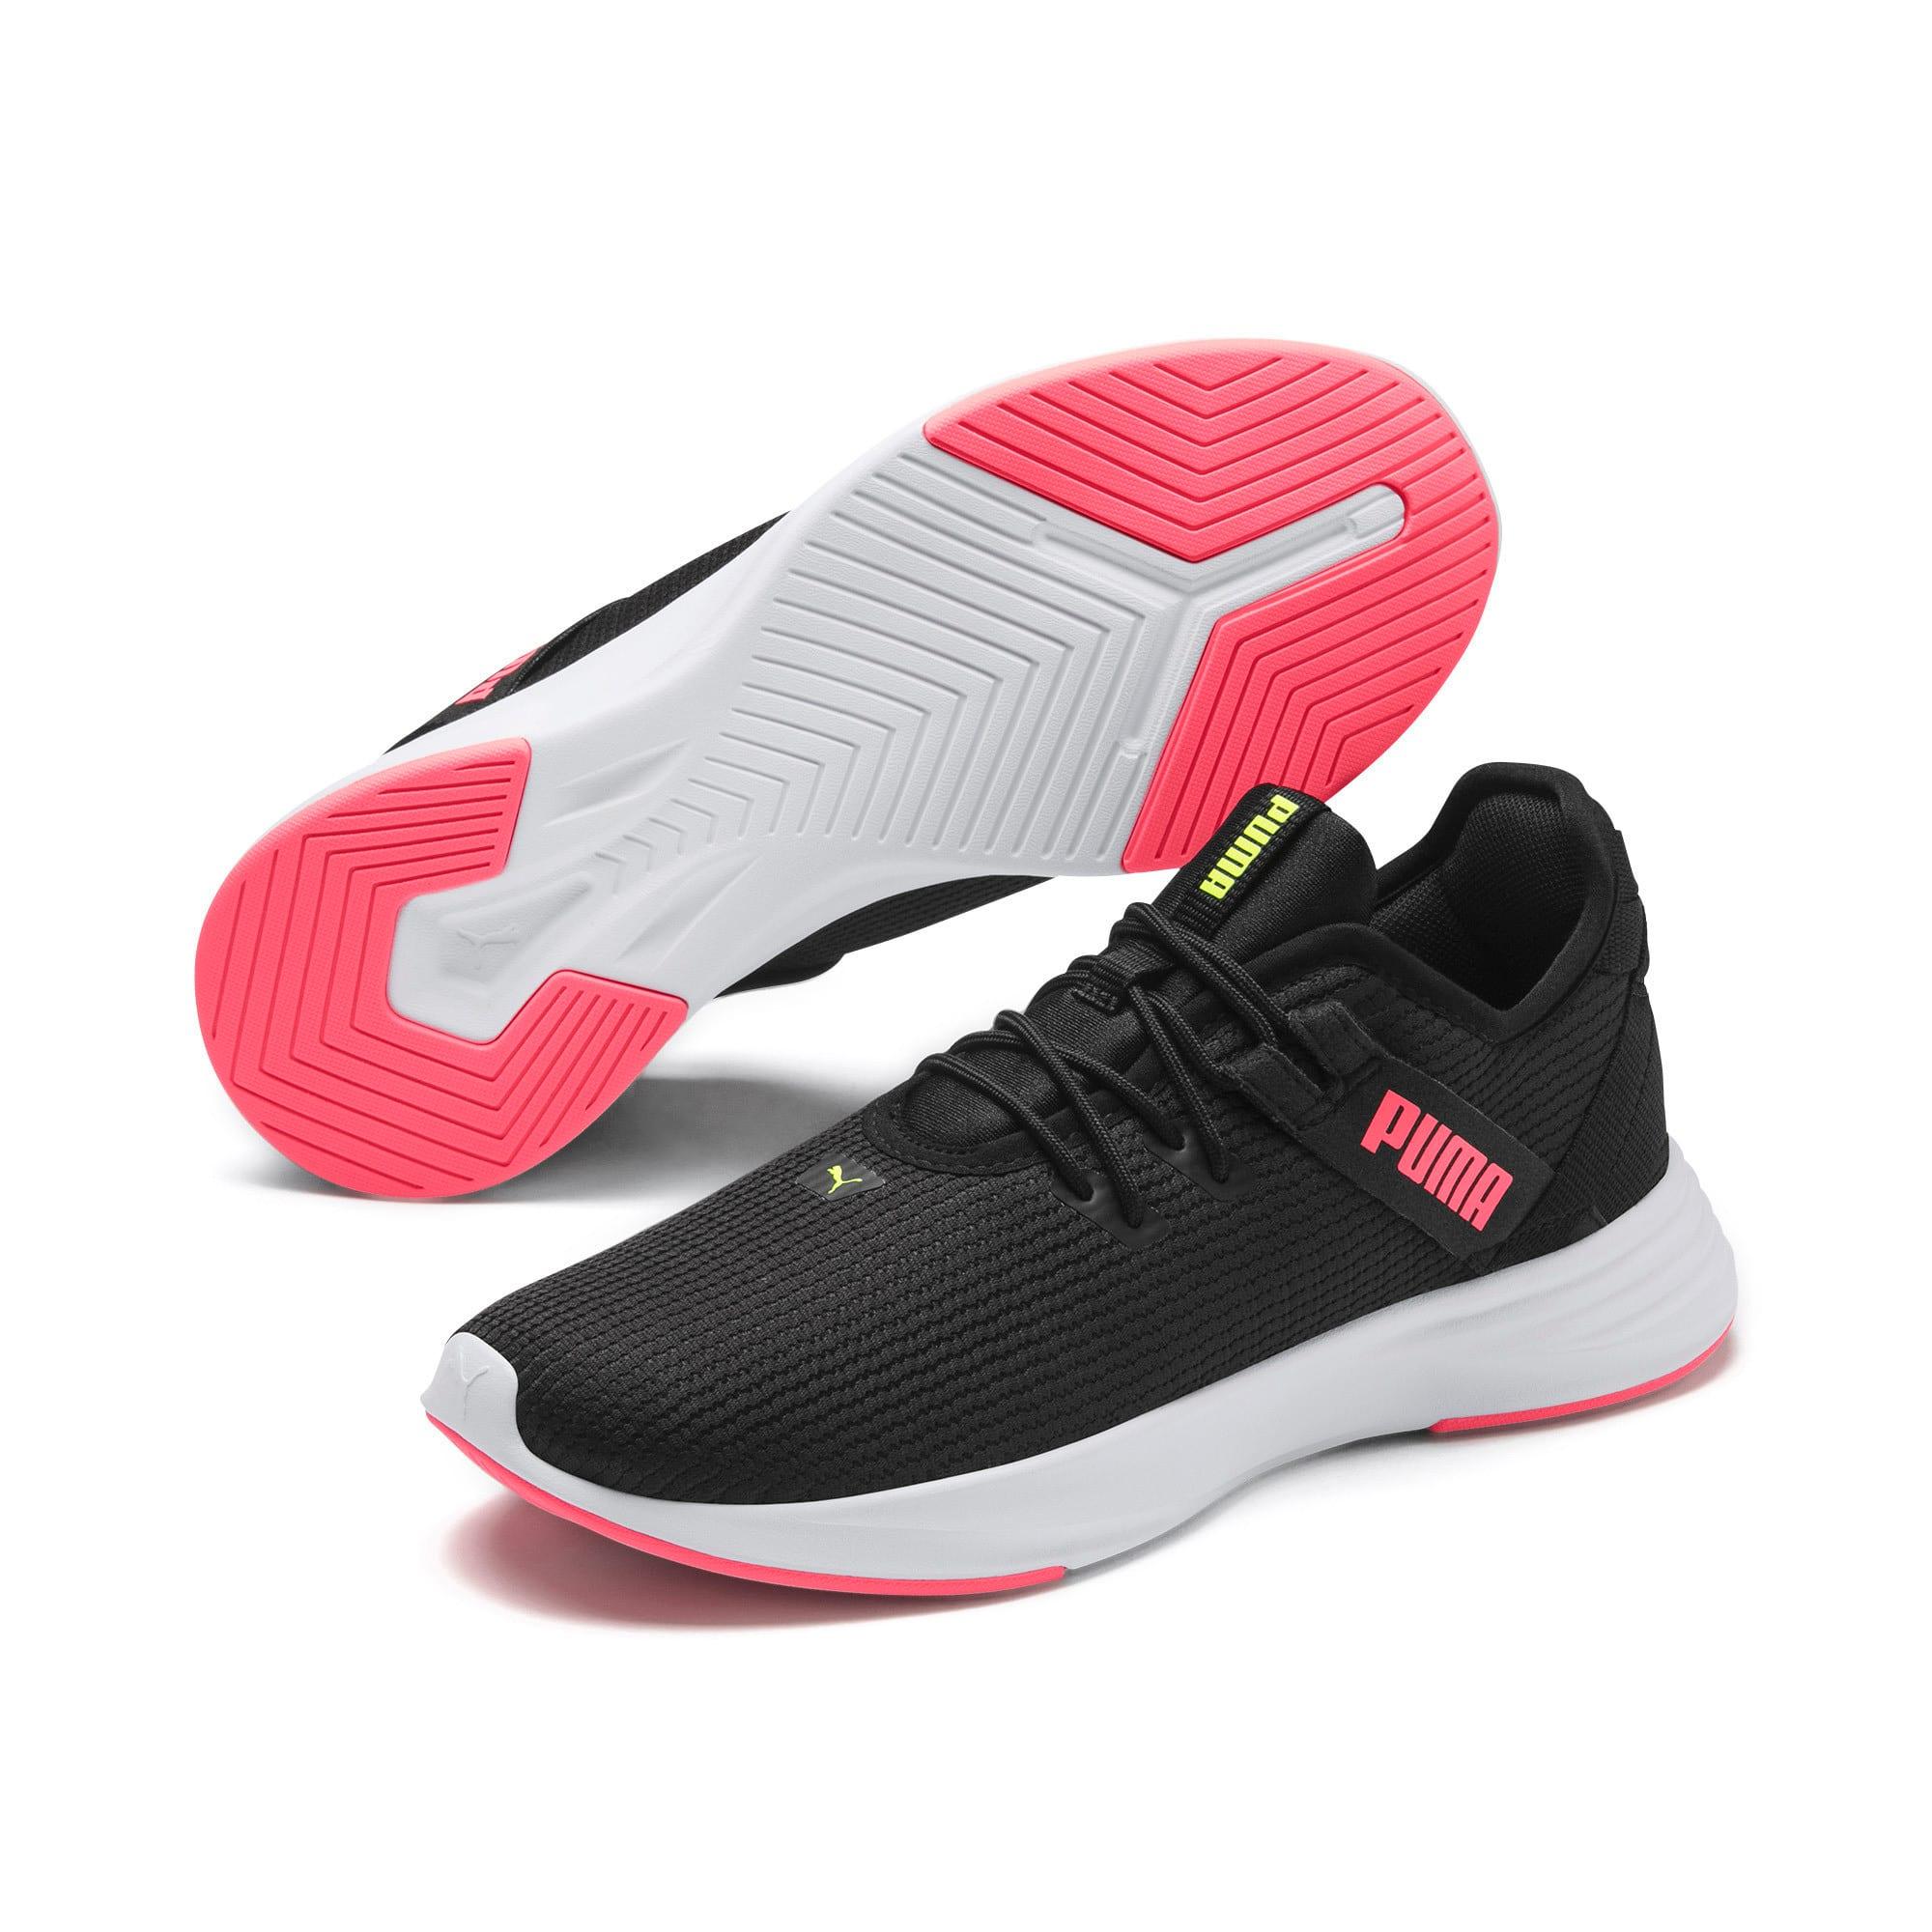 Thumbnail 3 of Radiate XT Women's Training Shoes, Puma Black-Pink Alert, medium